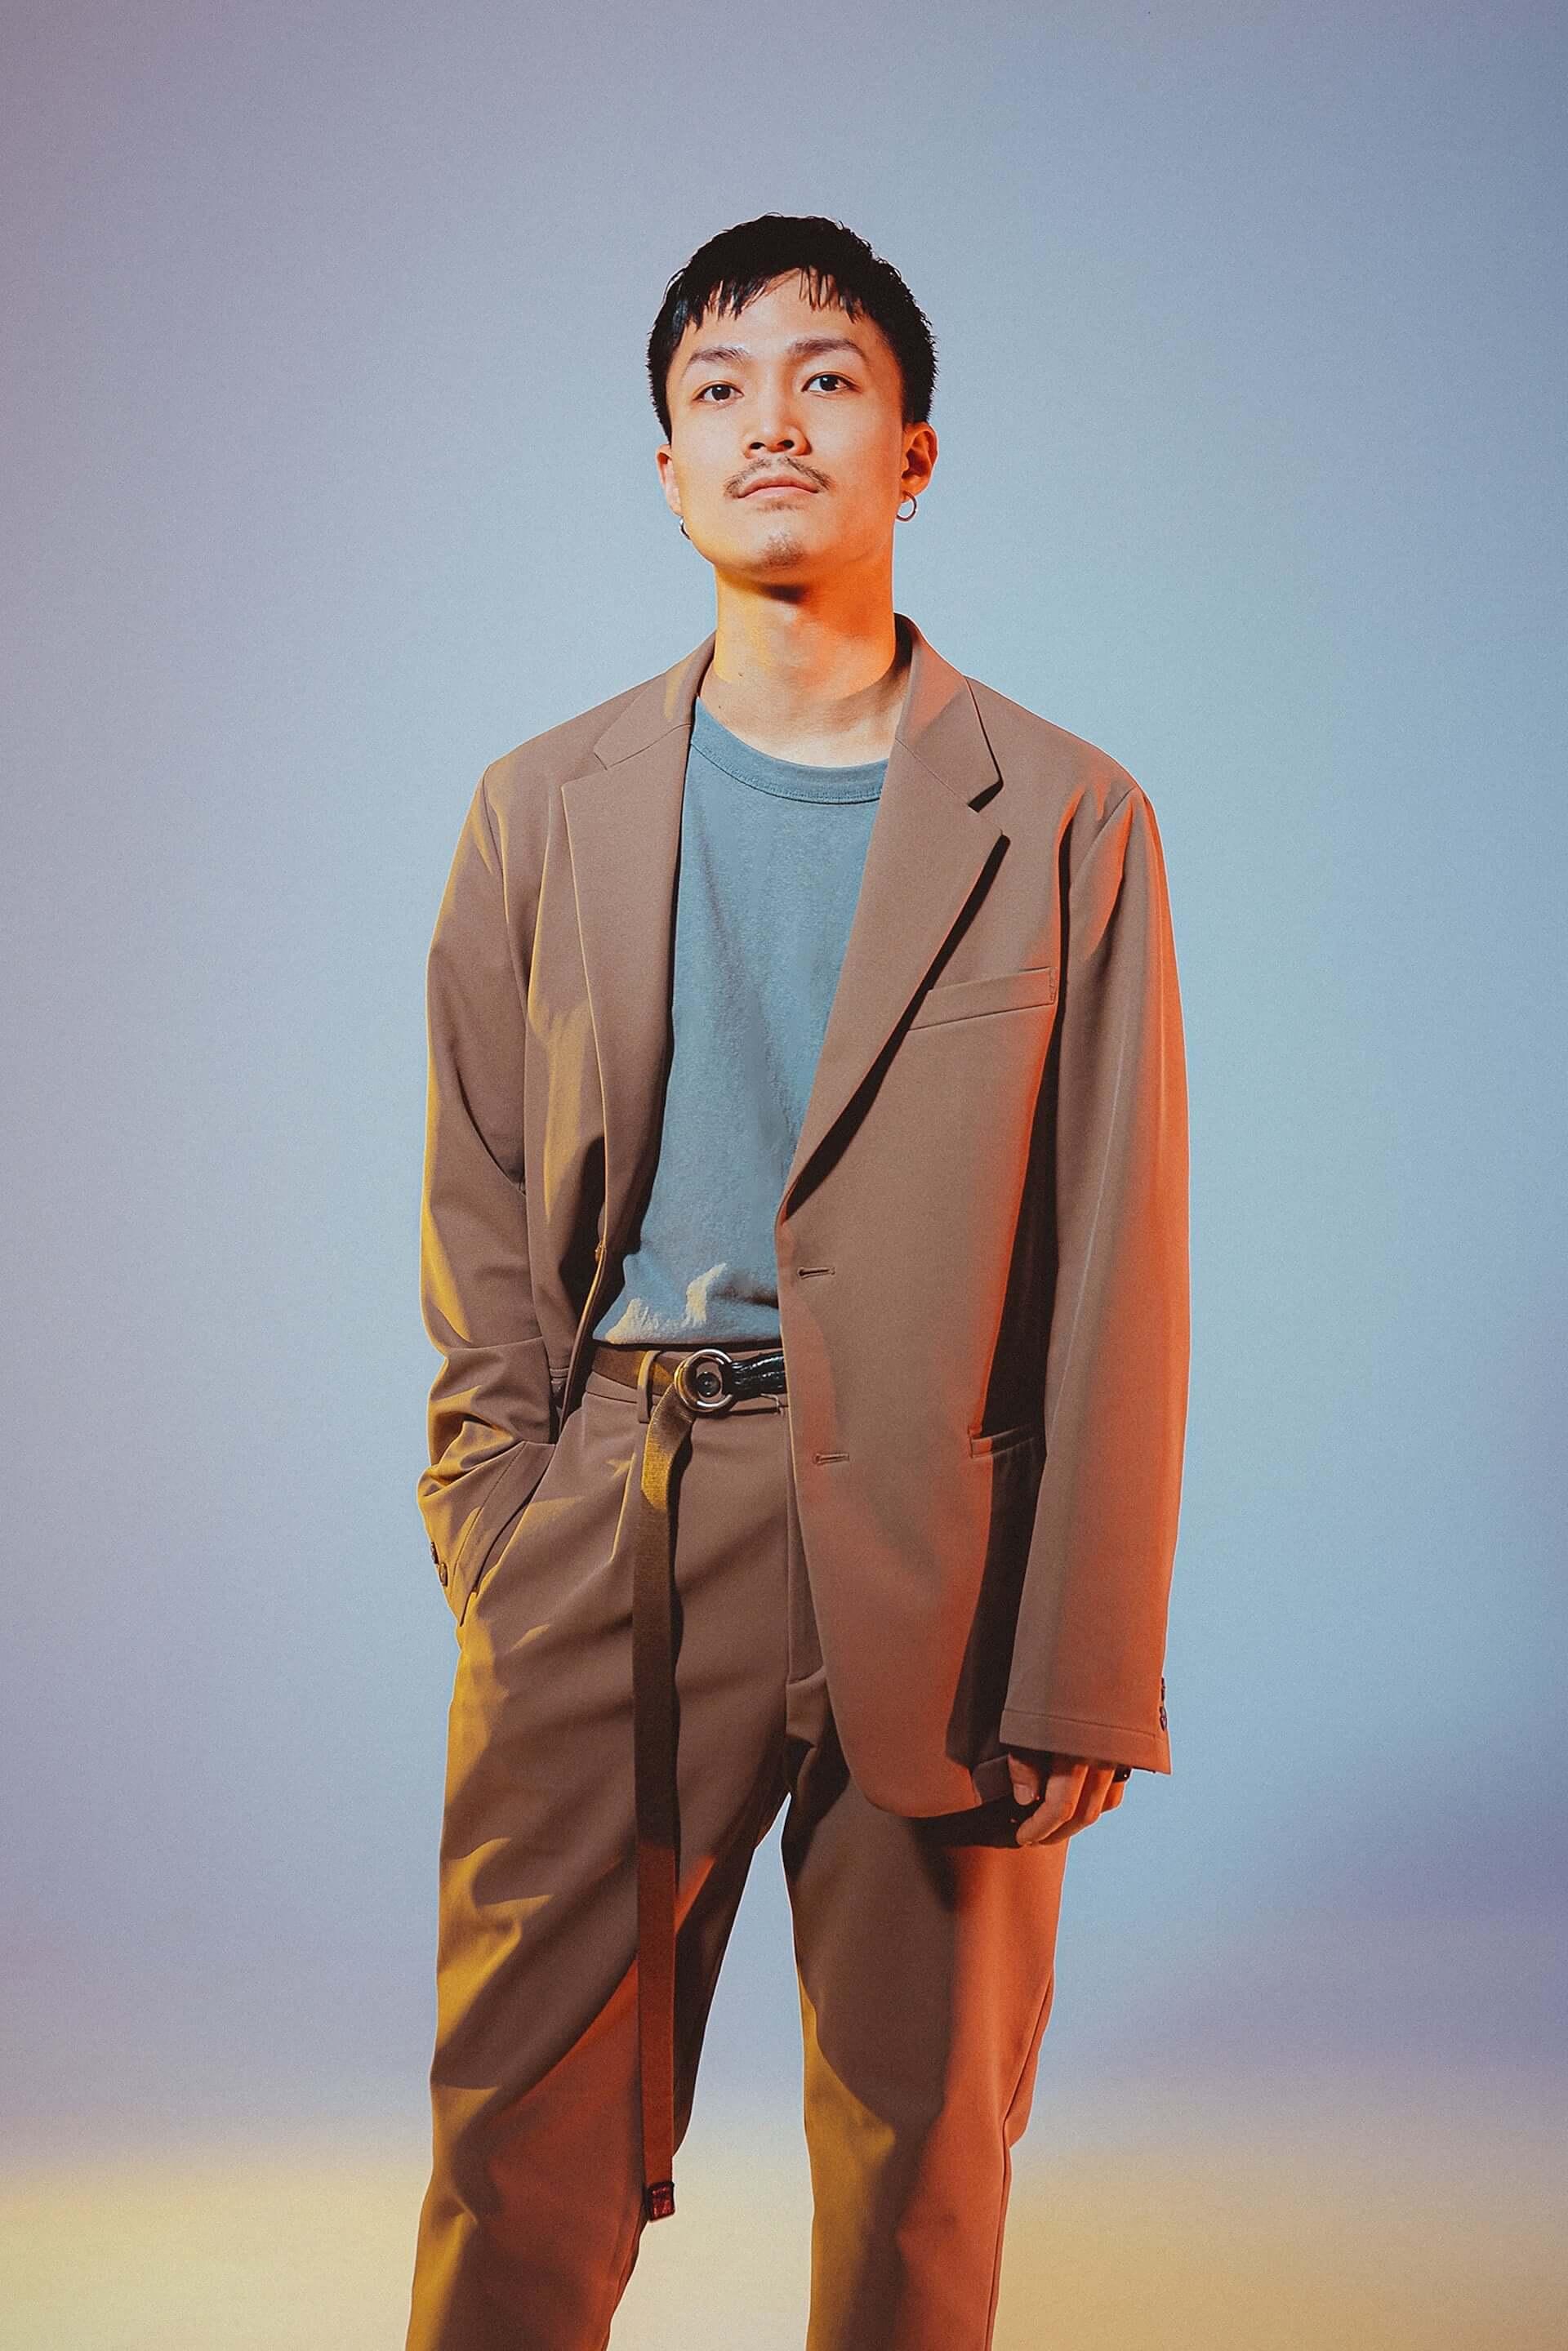 Kan SanoをフィーチャーしたShin Sakiuraの先行シングル「ほんとは feat. Kan Sano」が本日配信開始 music200311_shinsakiura_3-1920x2879